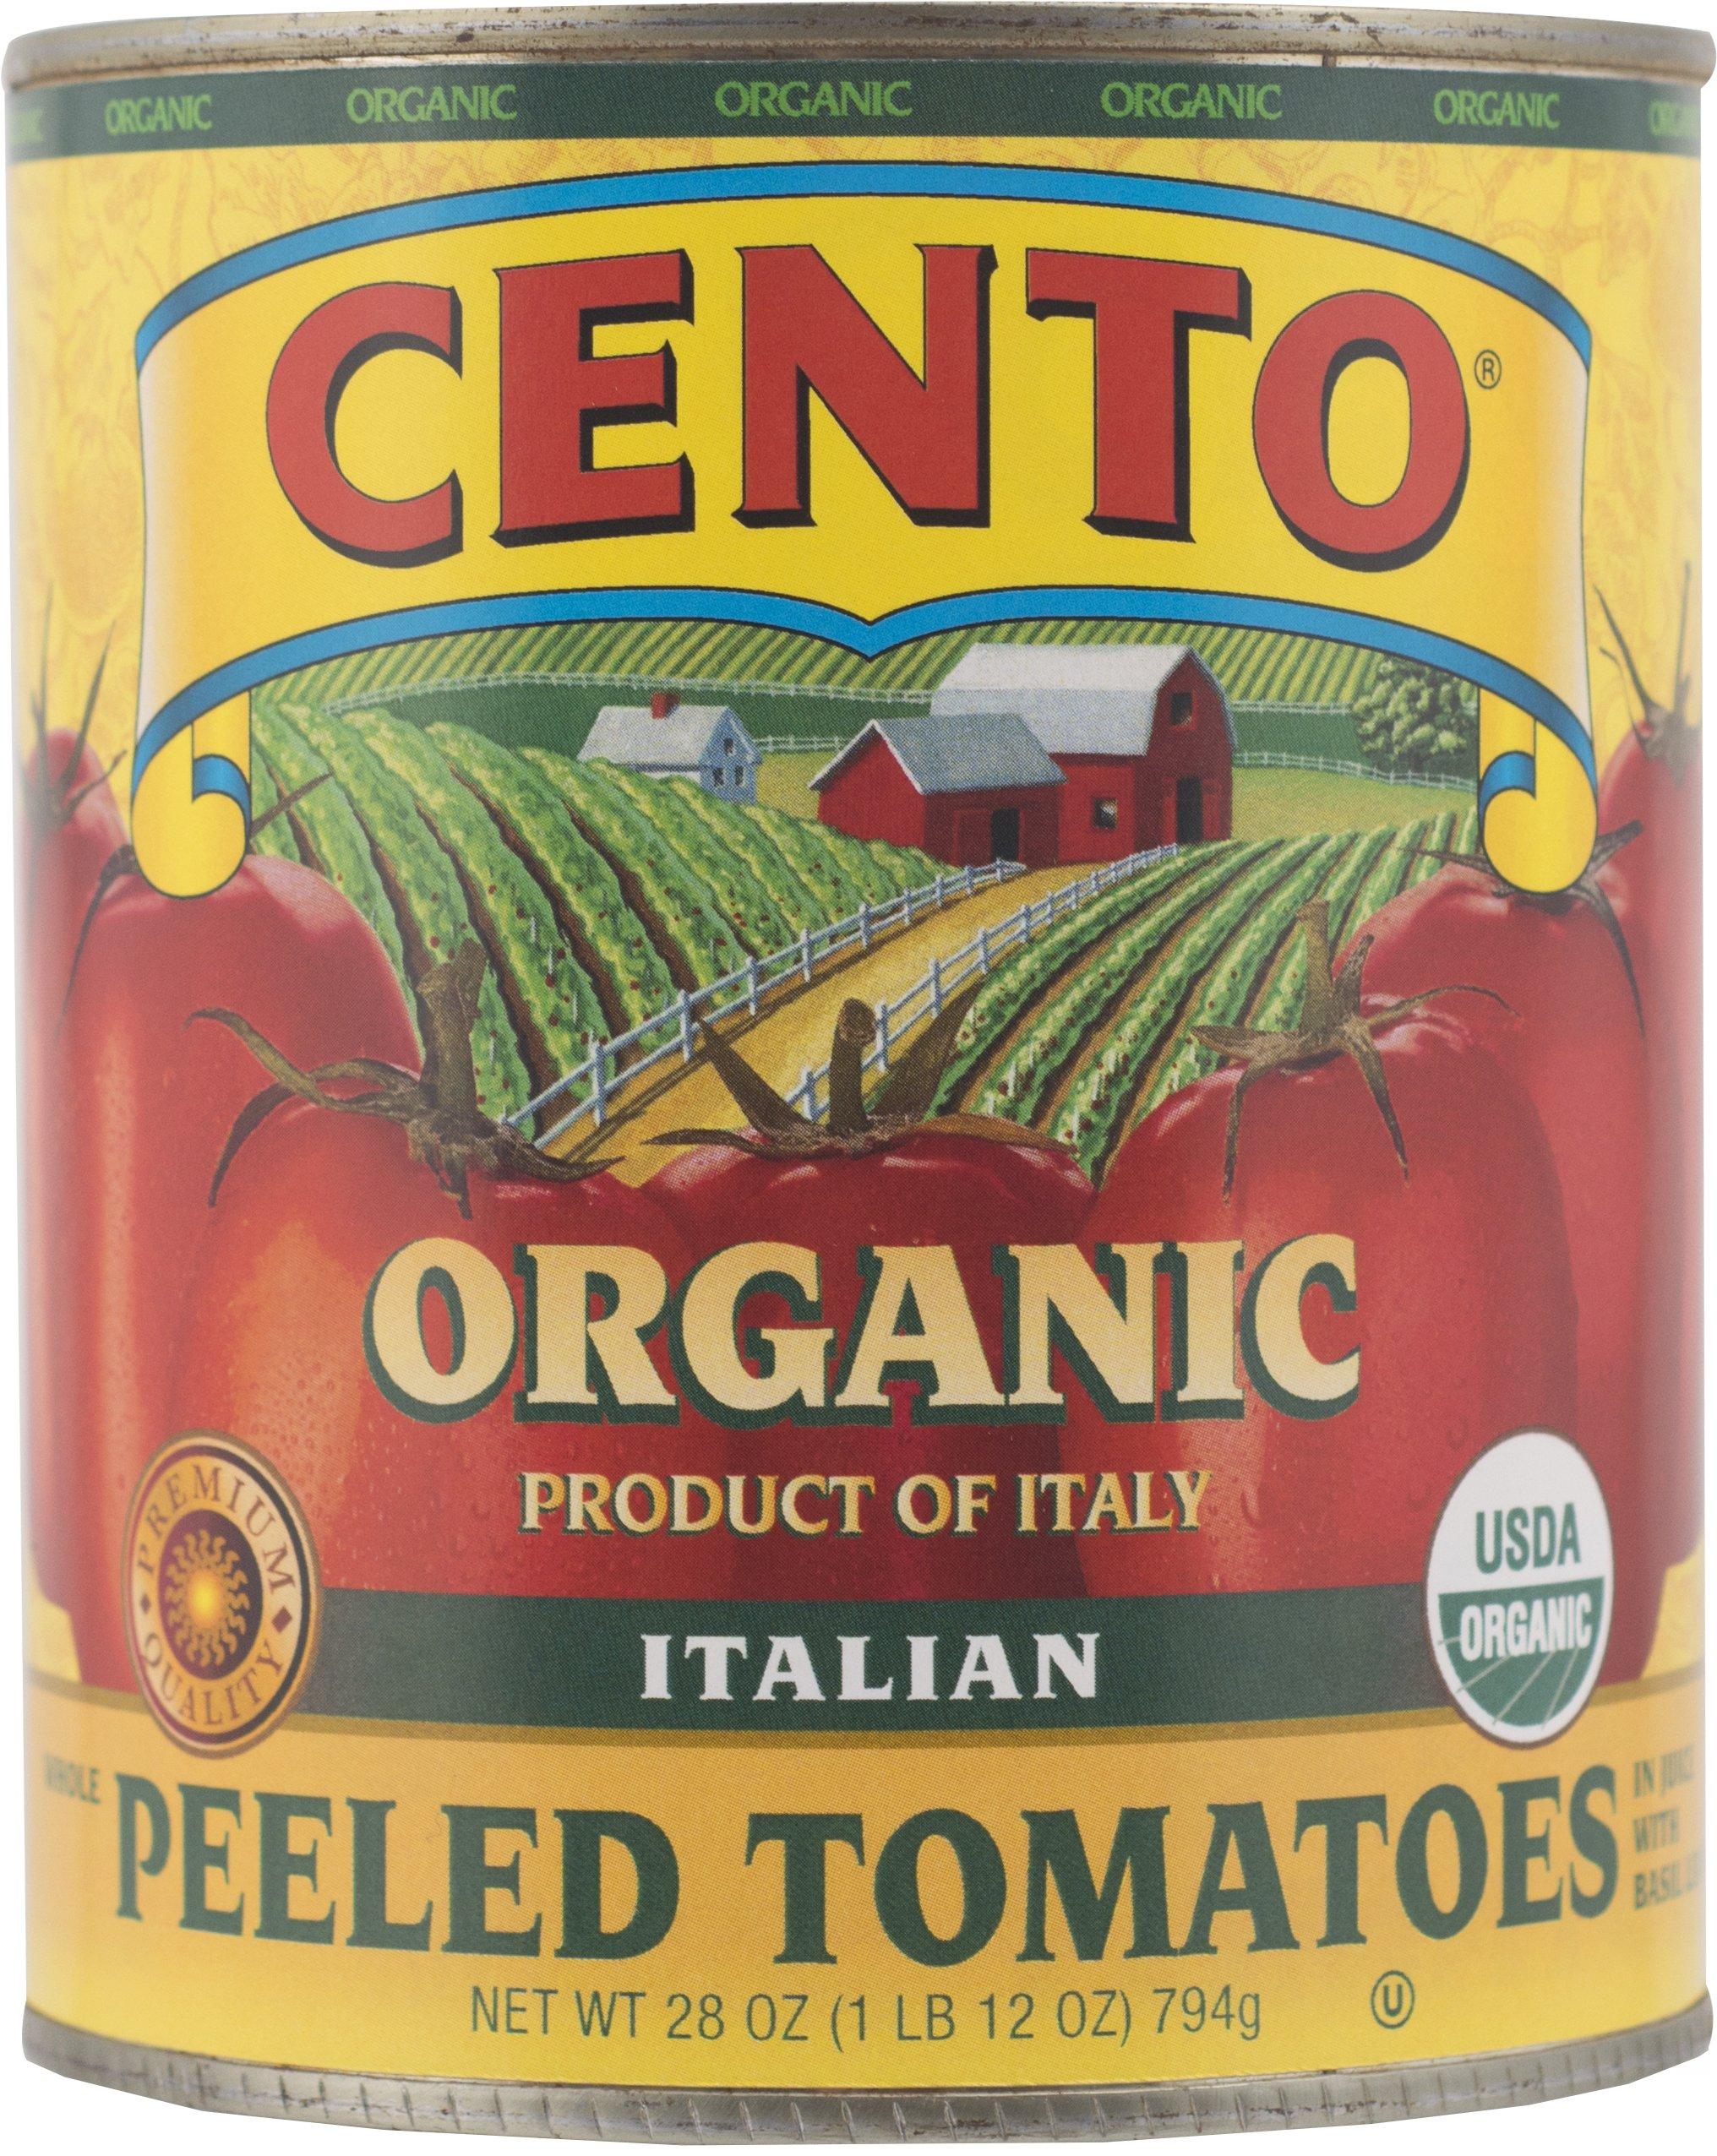 Cento Organic Italian Peeled Tomatoes, 28 Ounce (Pack of 6)